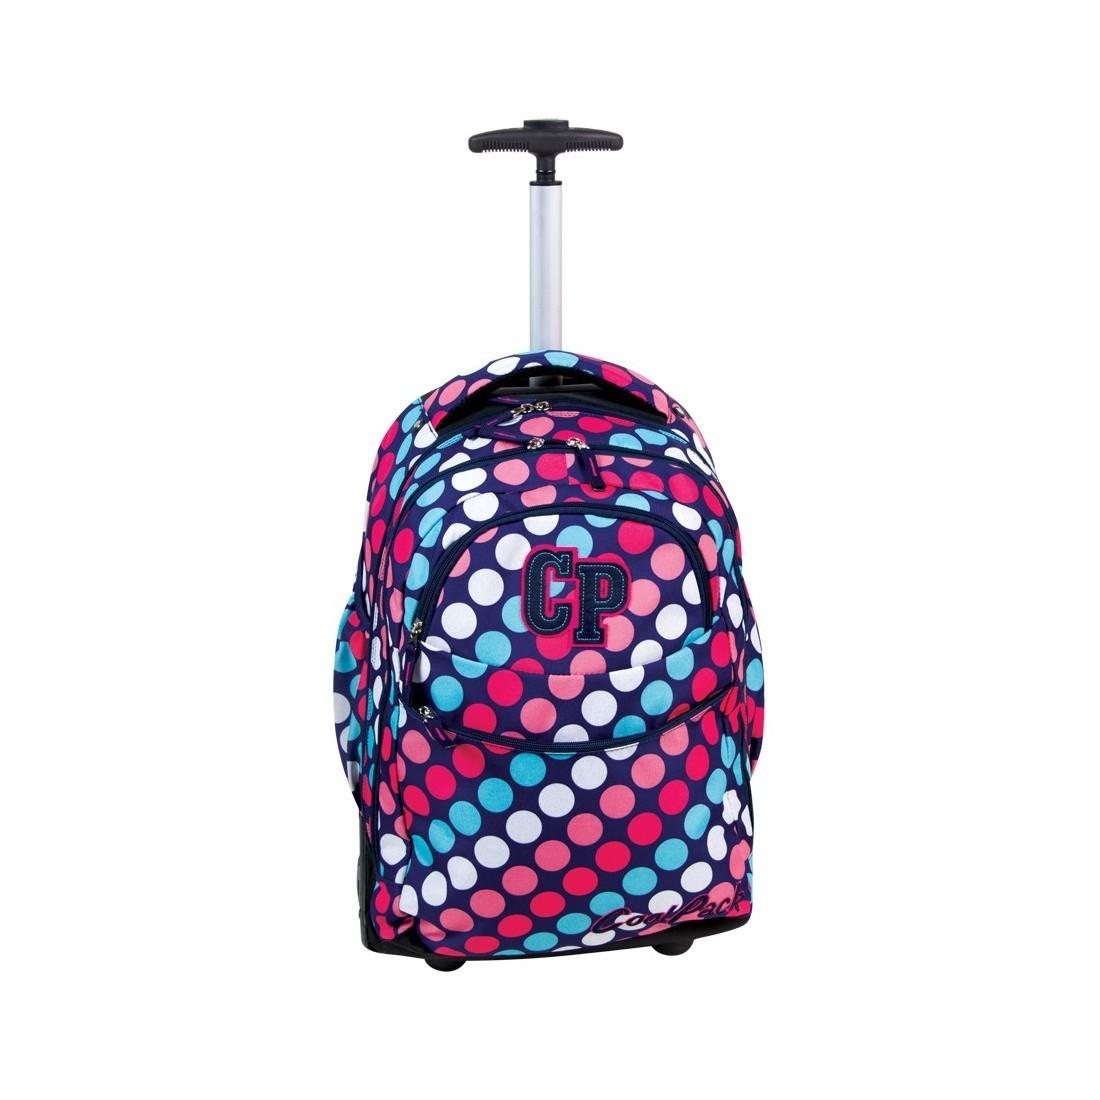 Plecak CoolPack na kółkach dla dziewczyny w kropki - RAPID DOTS CP 032 - plecak-tornister.pl